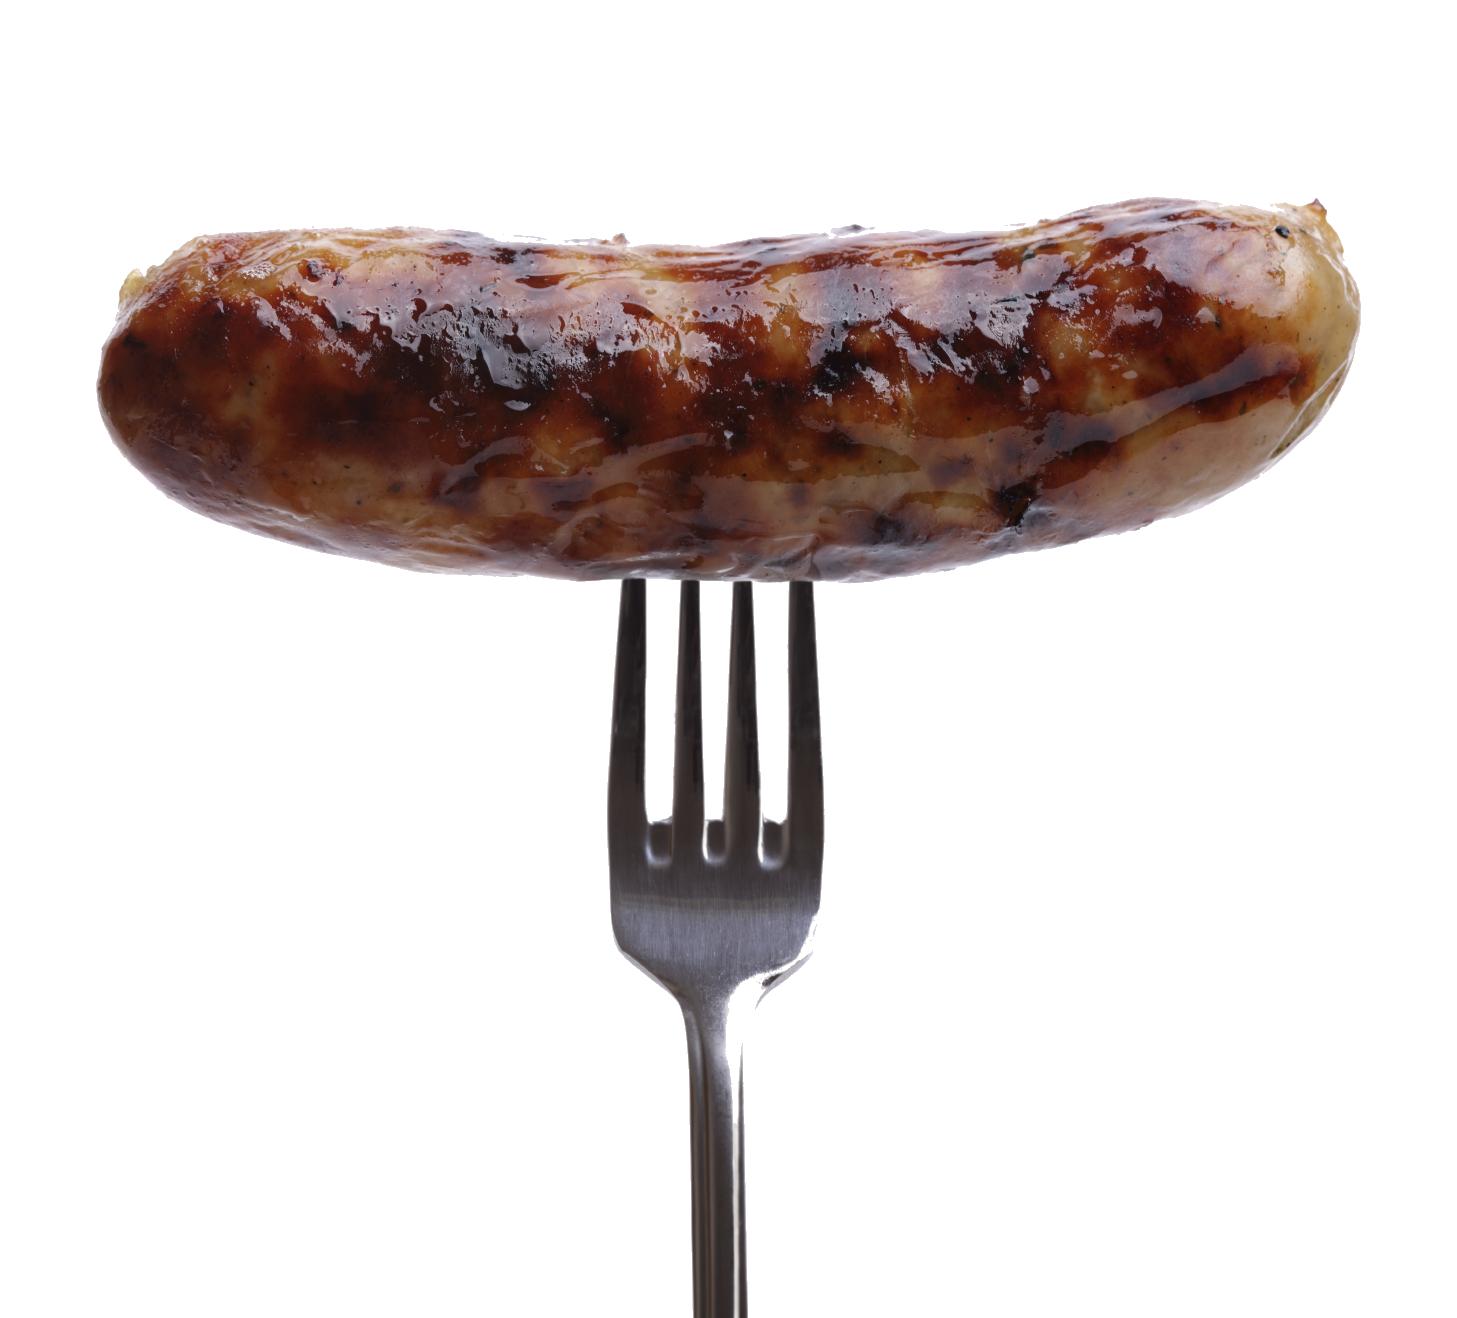 Sausage PNG - 27417